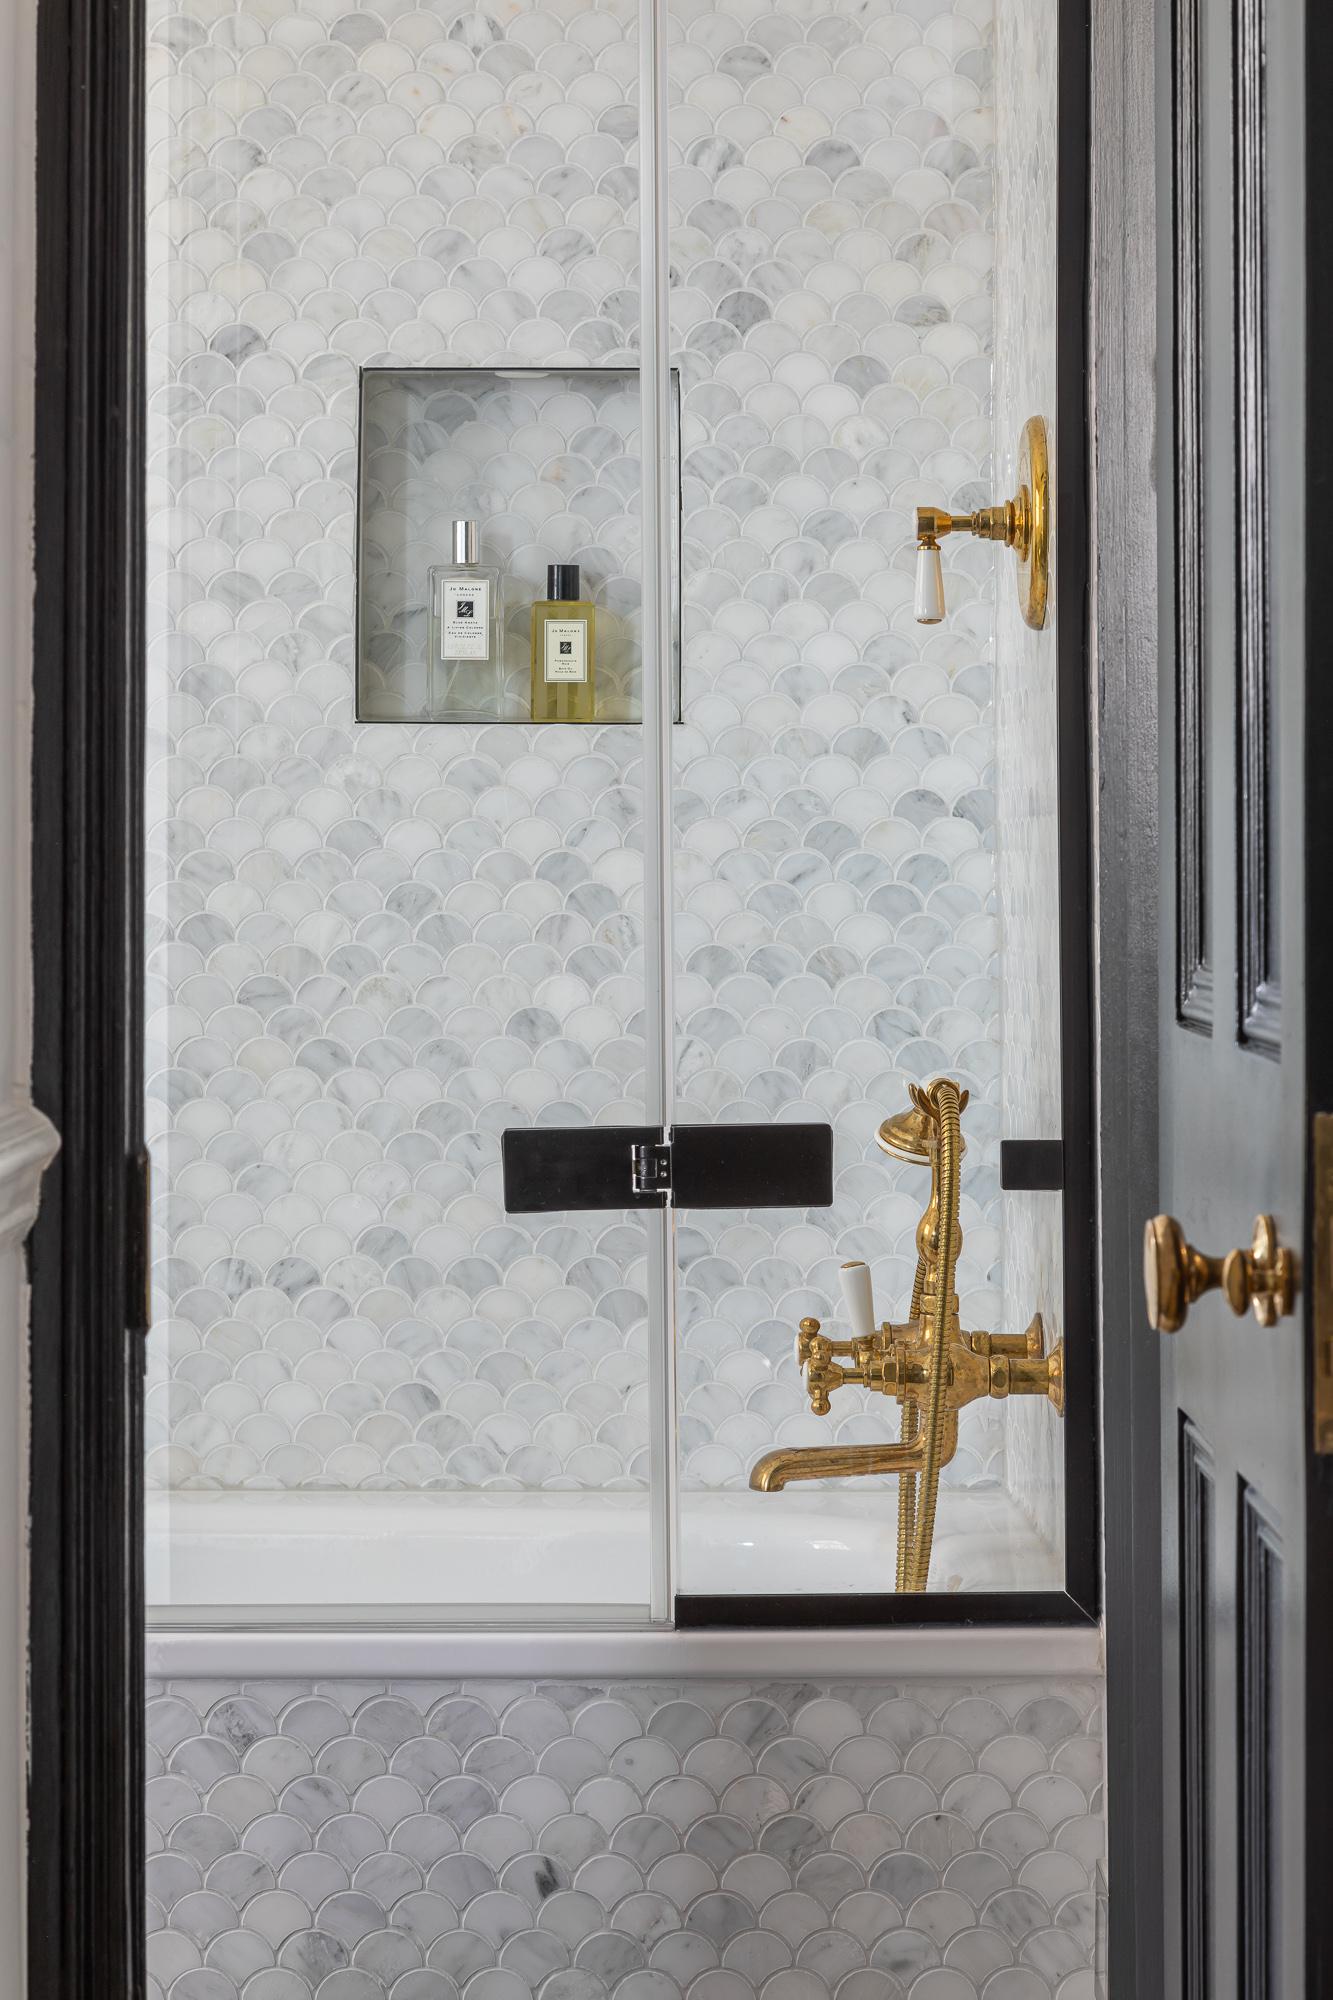 jonathan bond, bath & shower view from hallway, clapham, london